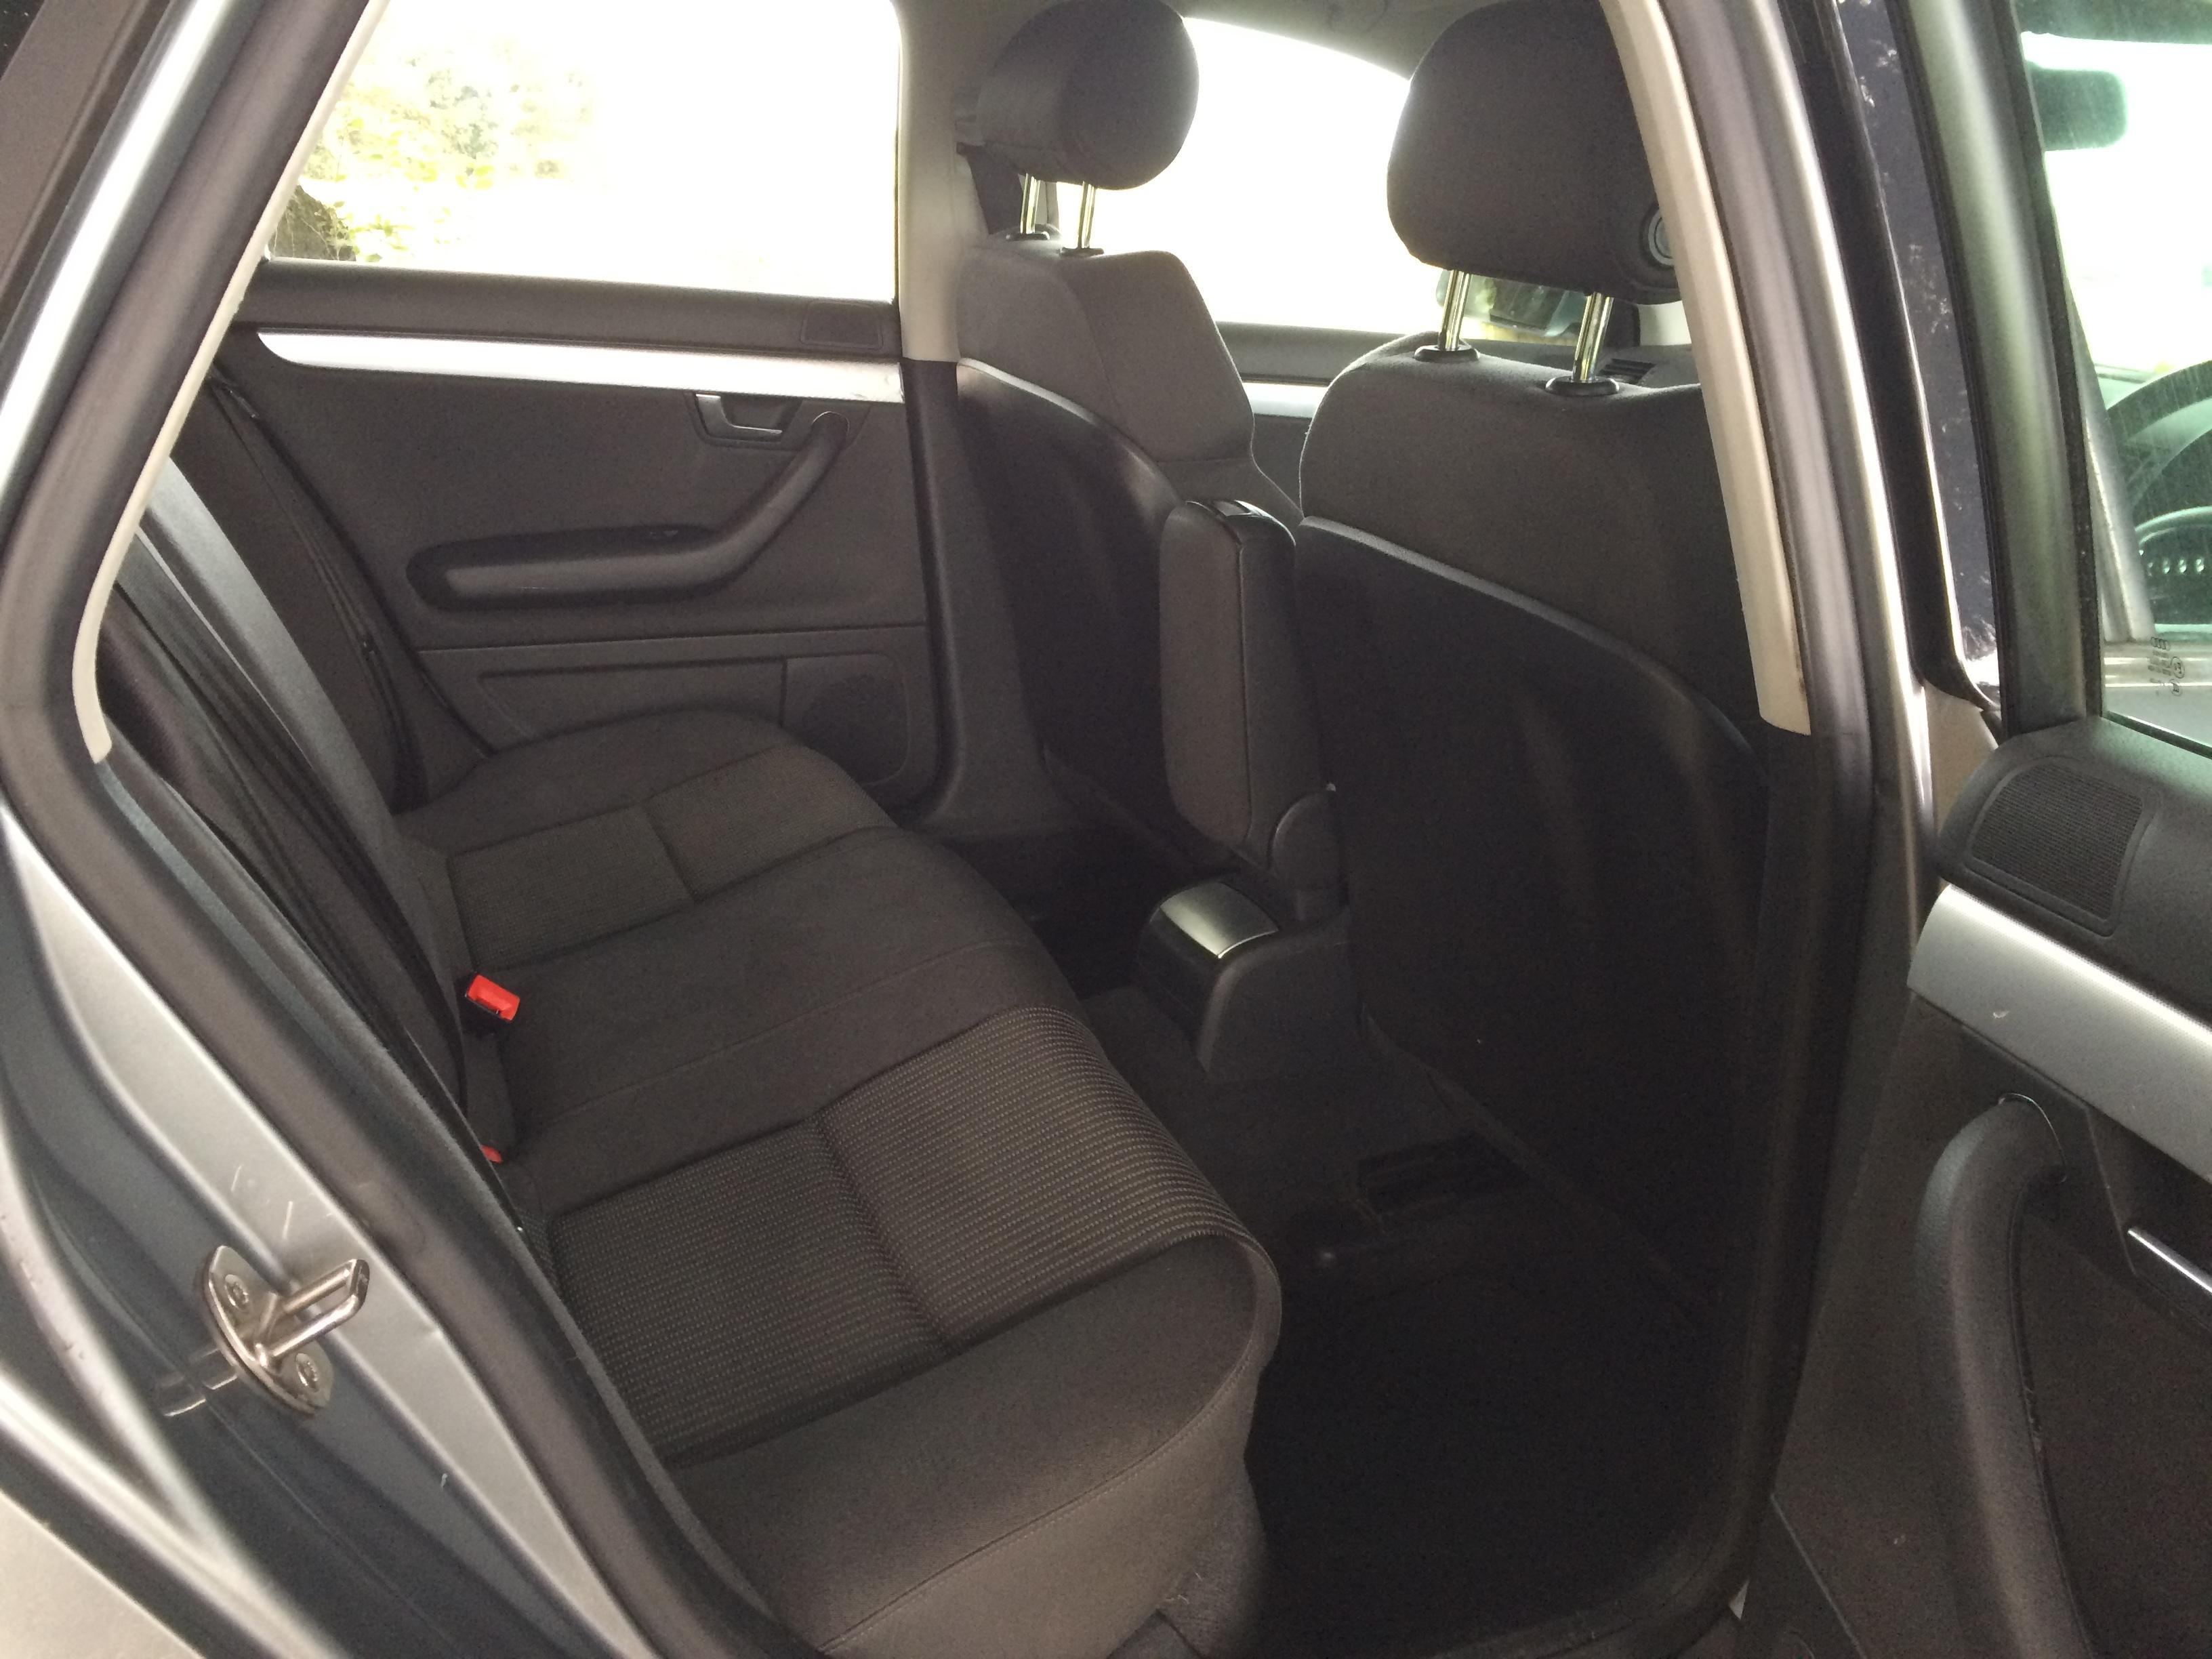 Audi Rear seats